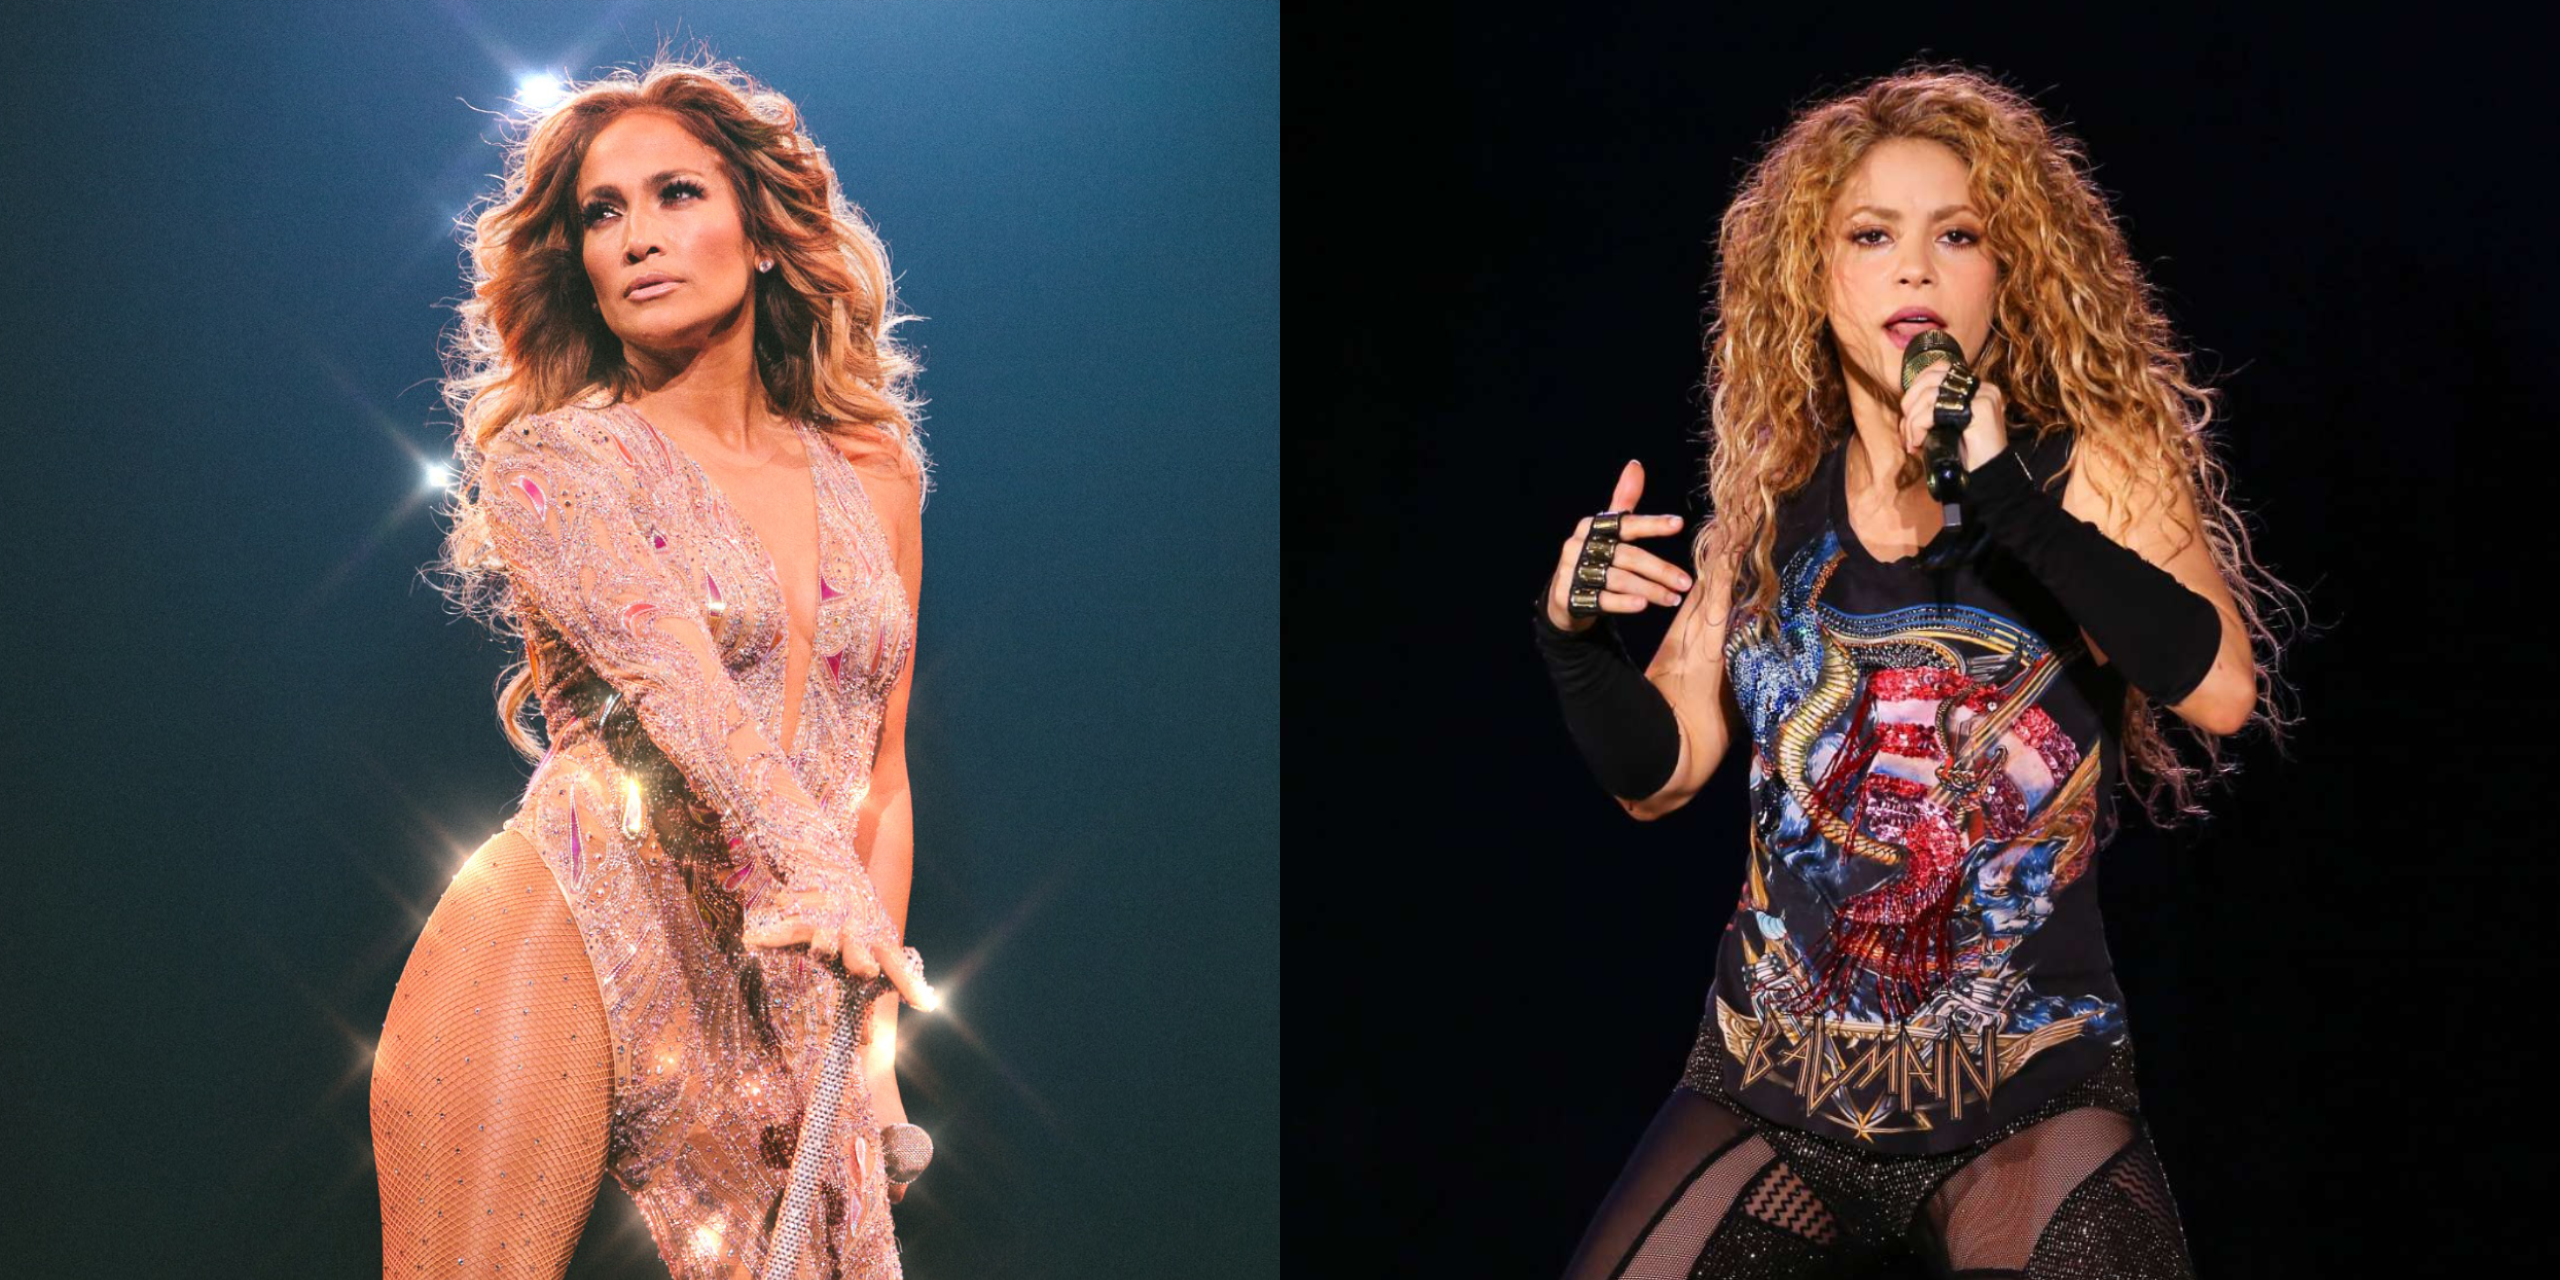 Jennifer Lopez and Shakira to co-headline the 2020 Super Bowl Halftime show